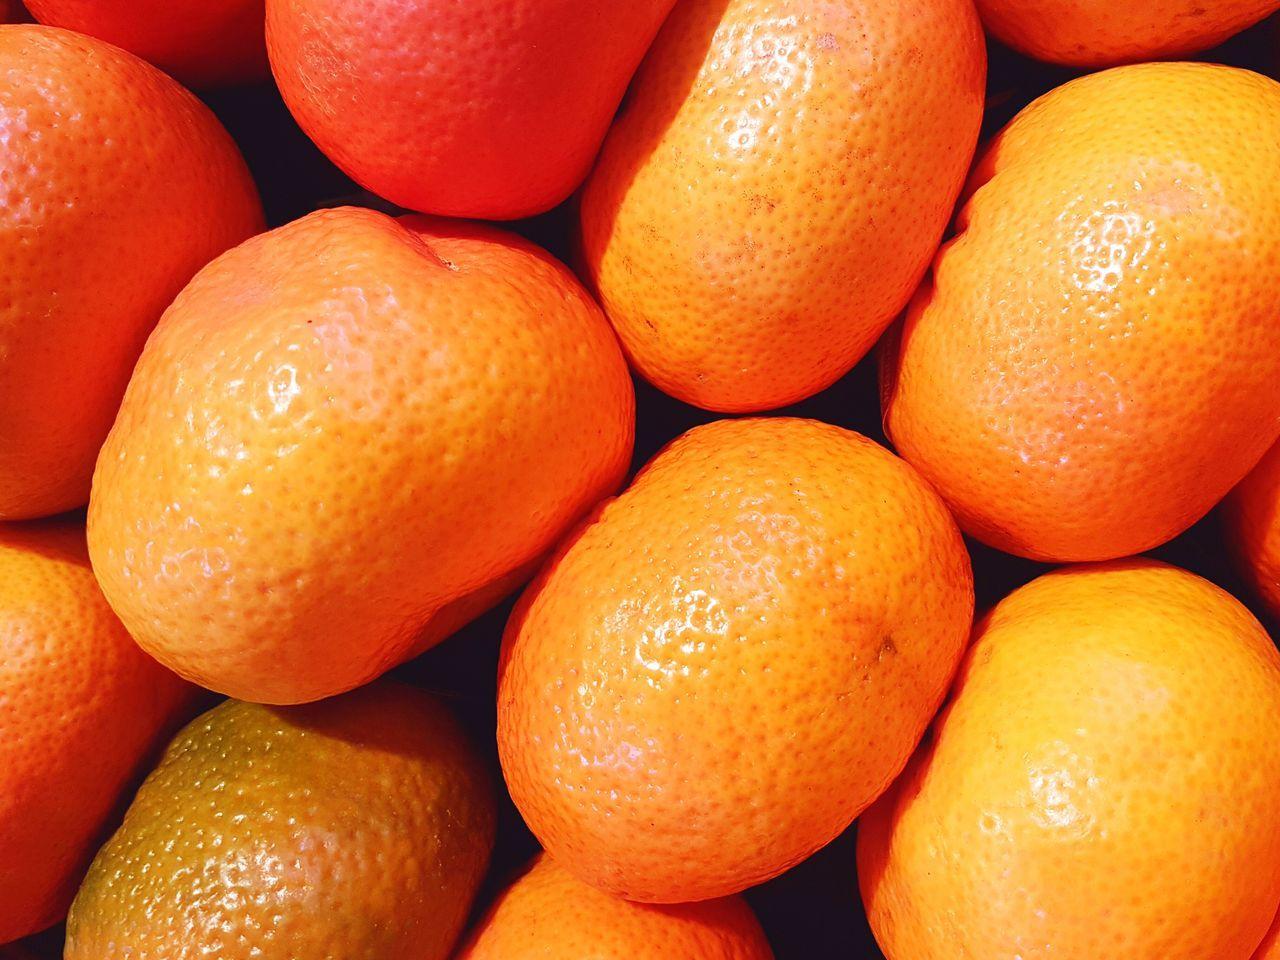 Fruit Freshness Healthy Eating Orange - Fruit Indoors  Full Frame Food Food And Drink Citrus Fruit Backgrounds Day Hot Eyupsultandemir EyeEm Best Shots Mandarins Smoothie No People Close-up